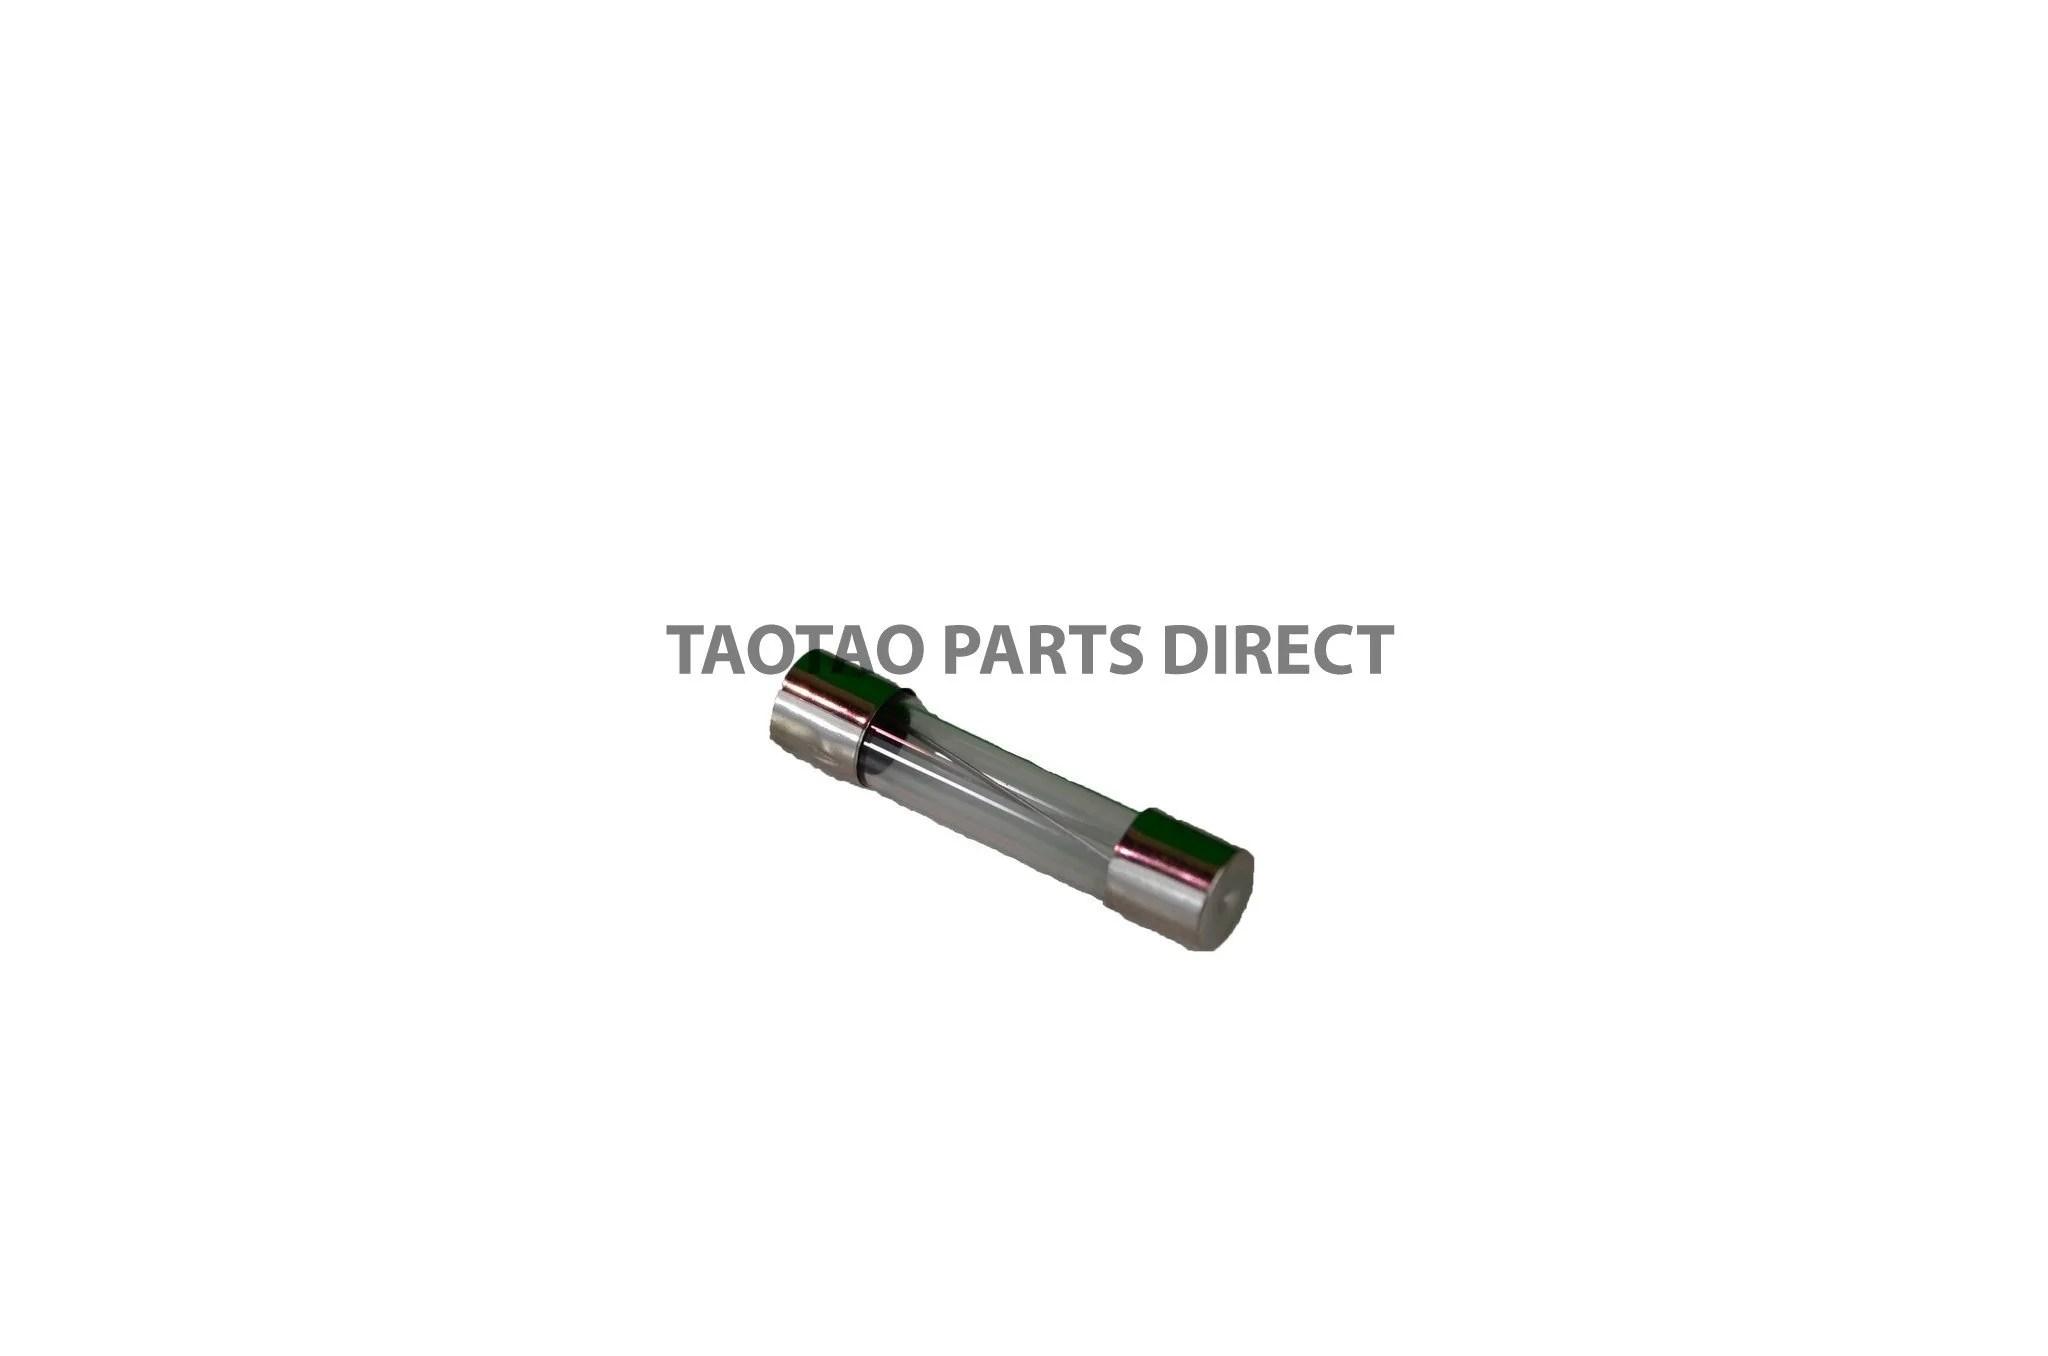 medium resolution of taotao fuse box wiring diagram10ah glass fuse taotao parts direct10ah glass fuse taotaopartsdirect com